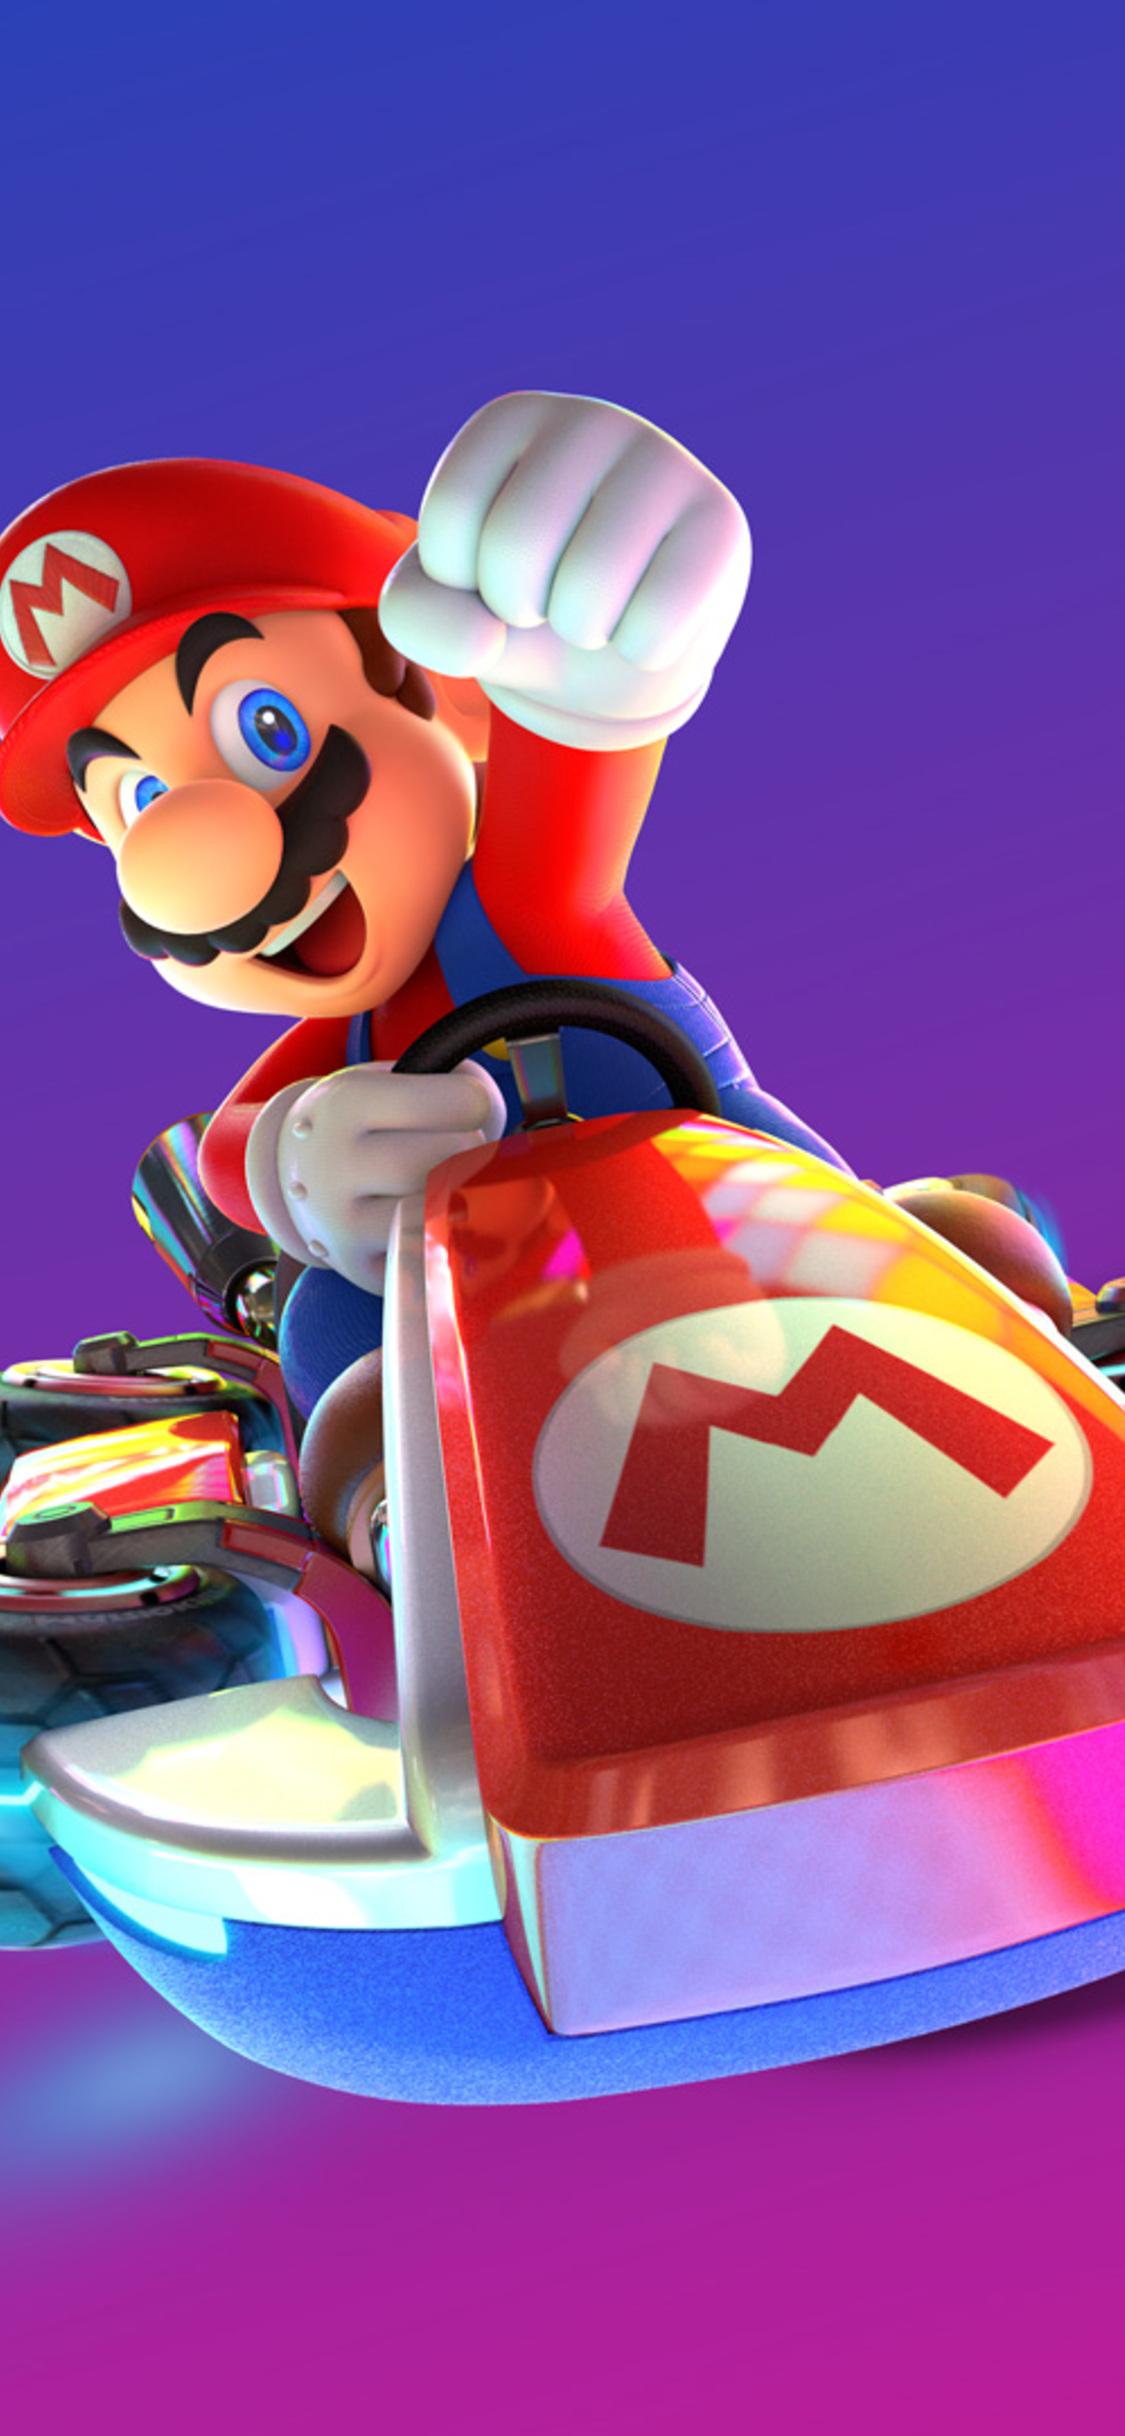 1125x2436 Mario Kart 8 Deluxe Nintendo Switch Game Iphone Xs Iphone